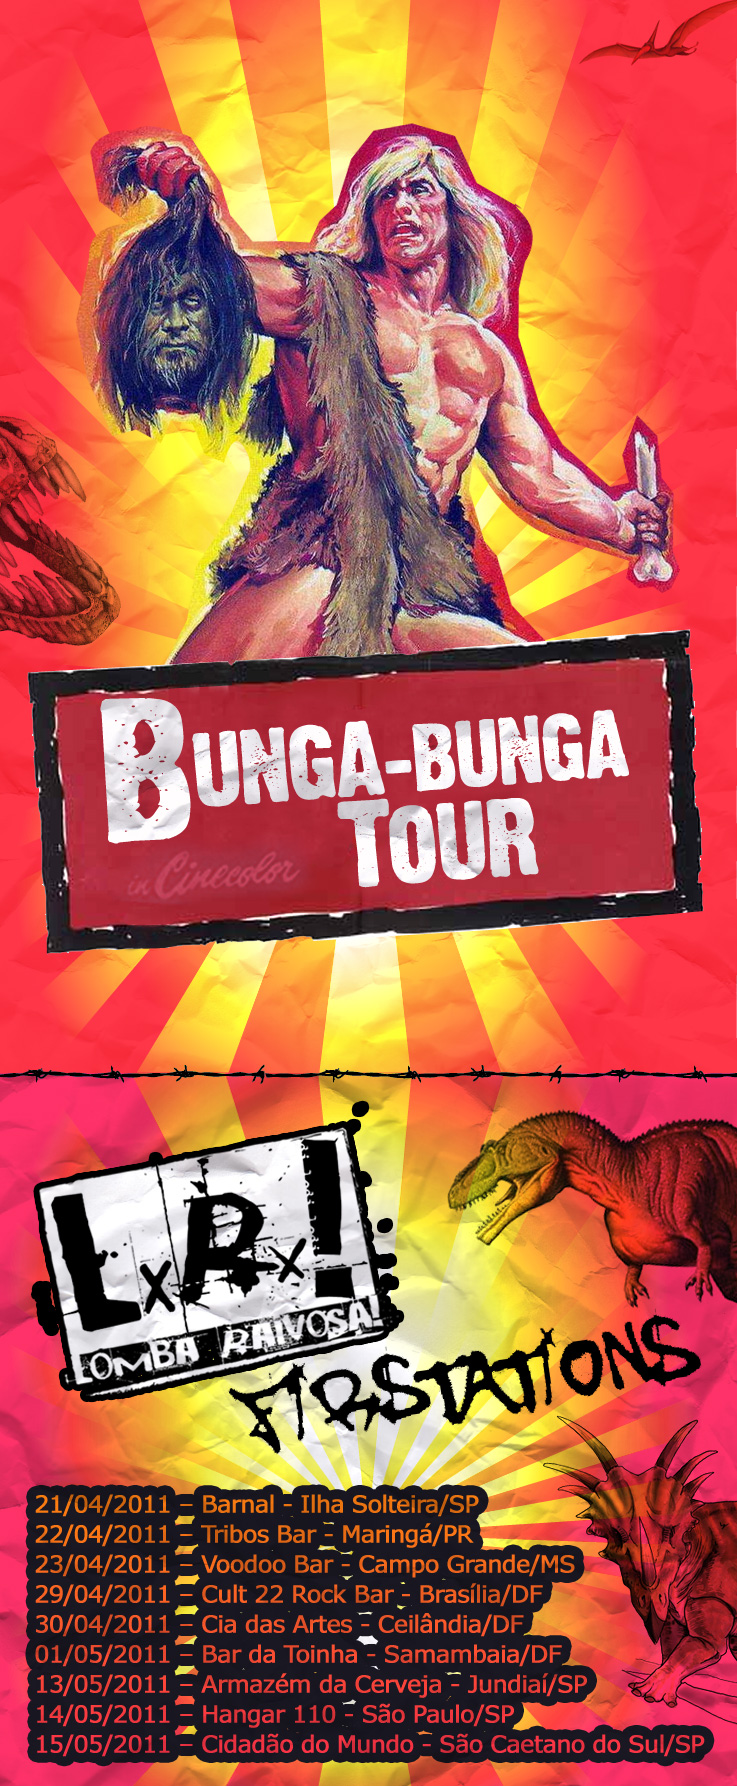 Bunga-bunga tour com Lomba Raivosa e Firstations